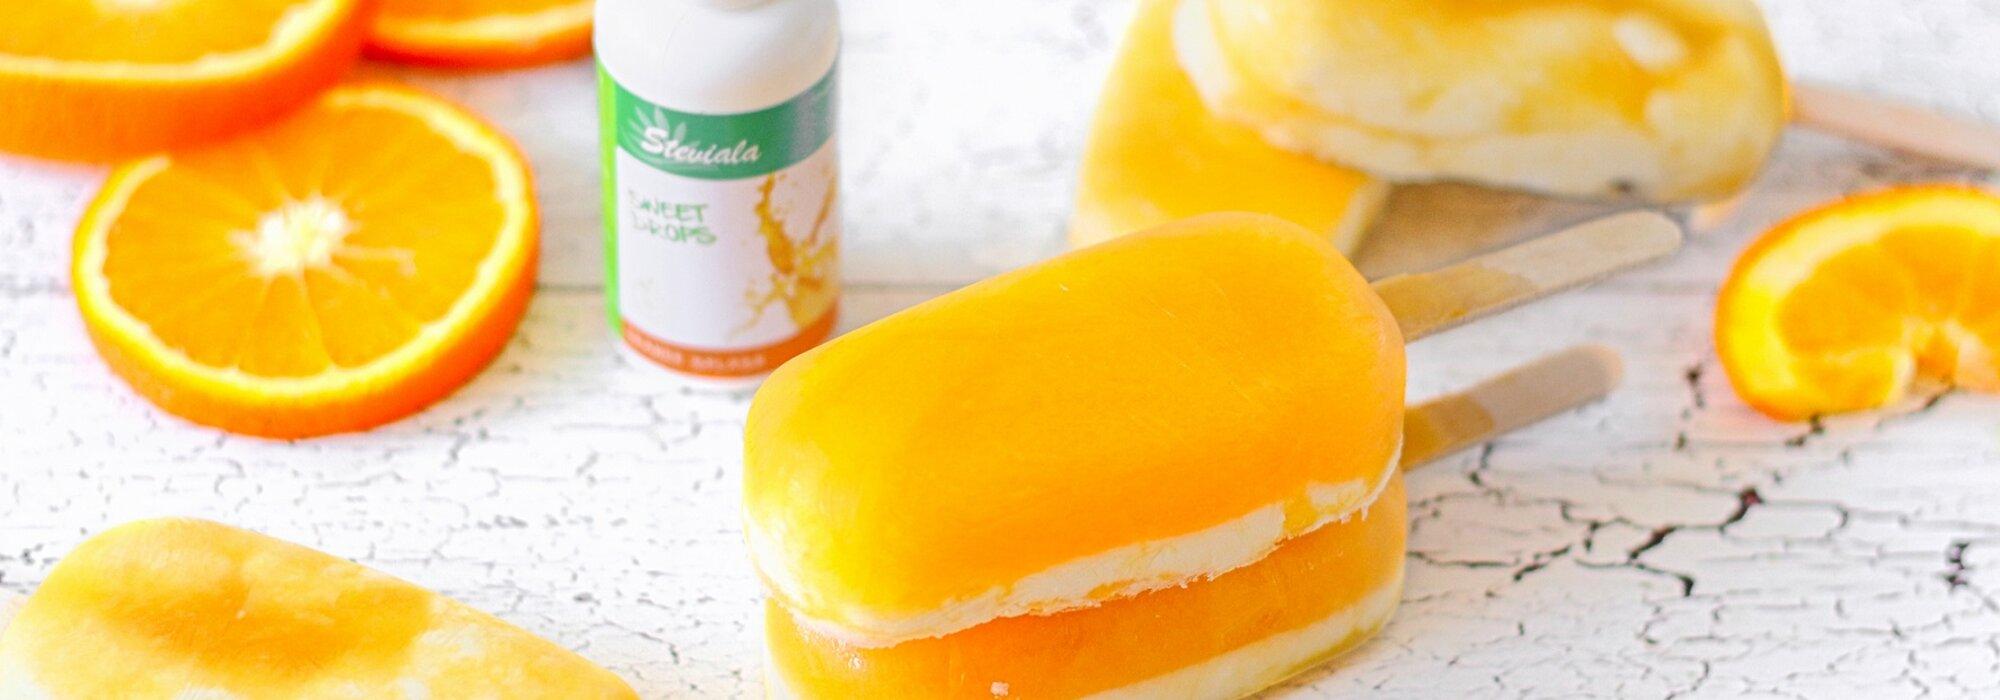 Koolhydraatbeperkte Orange Splash ijsjes